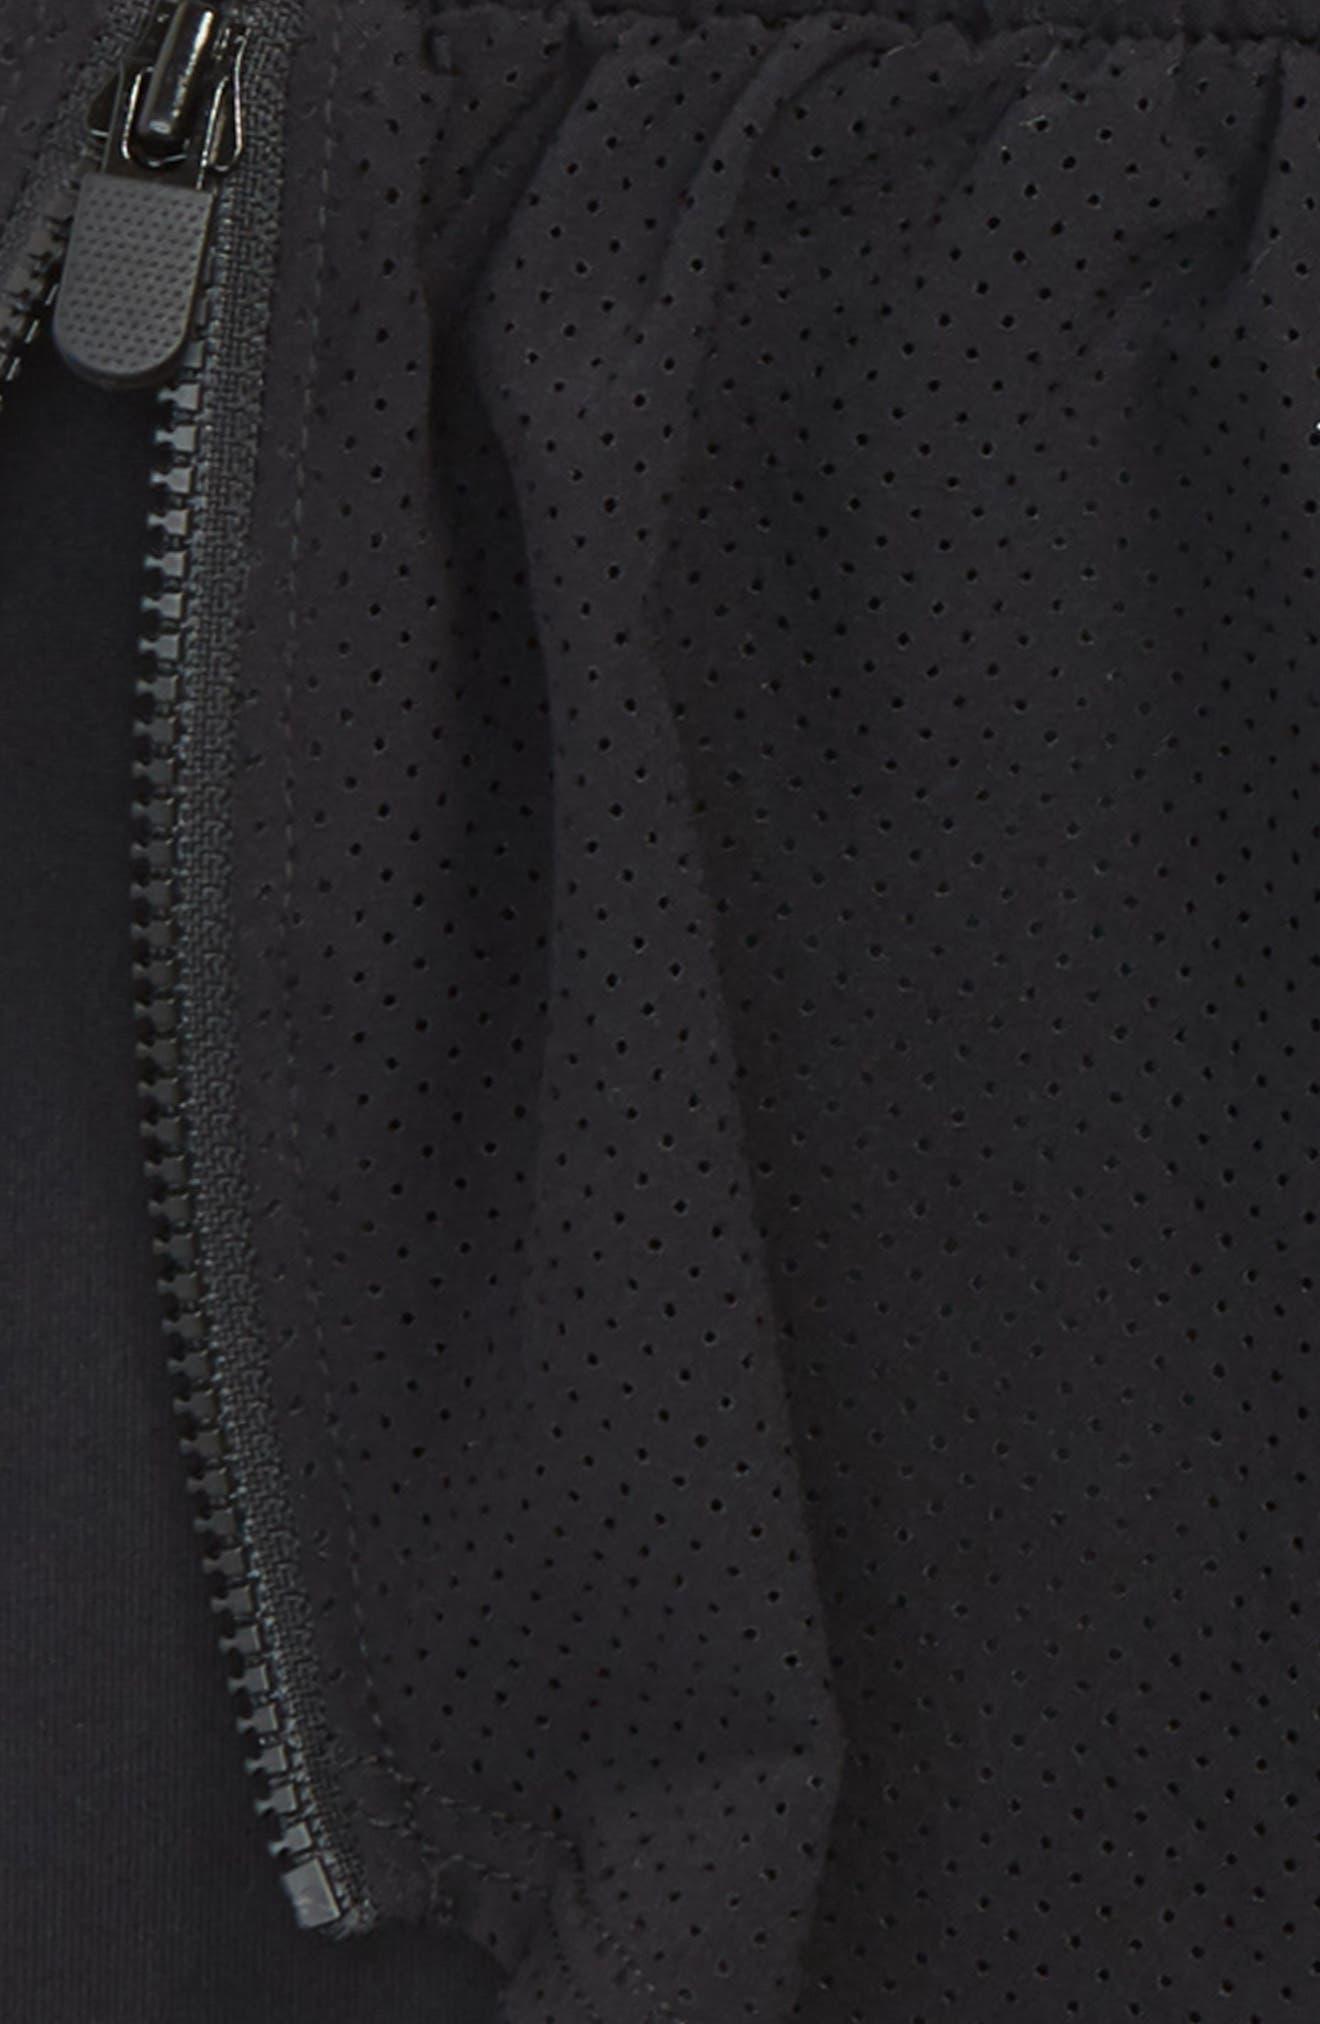 Double Layer Shorts,                             Alternate thumbnail 2, color,                             001